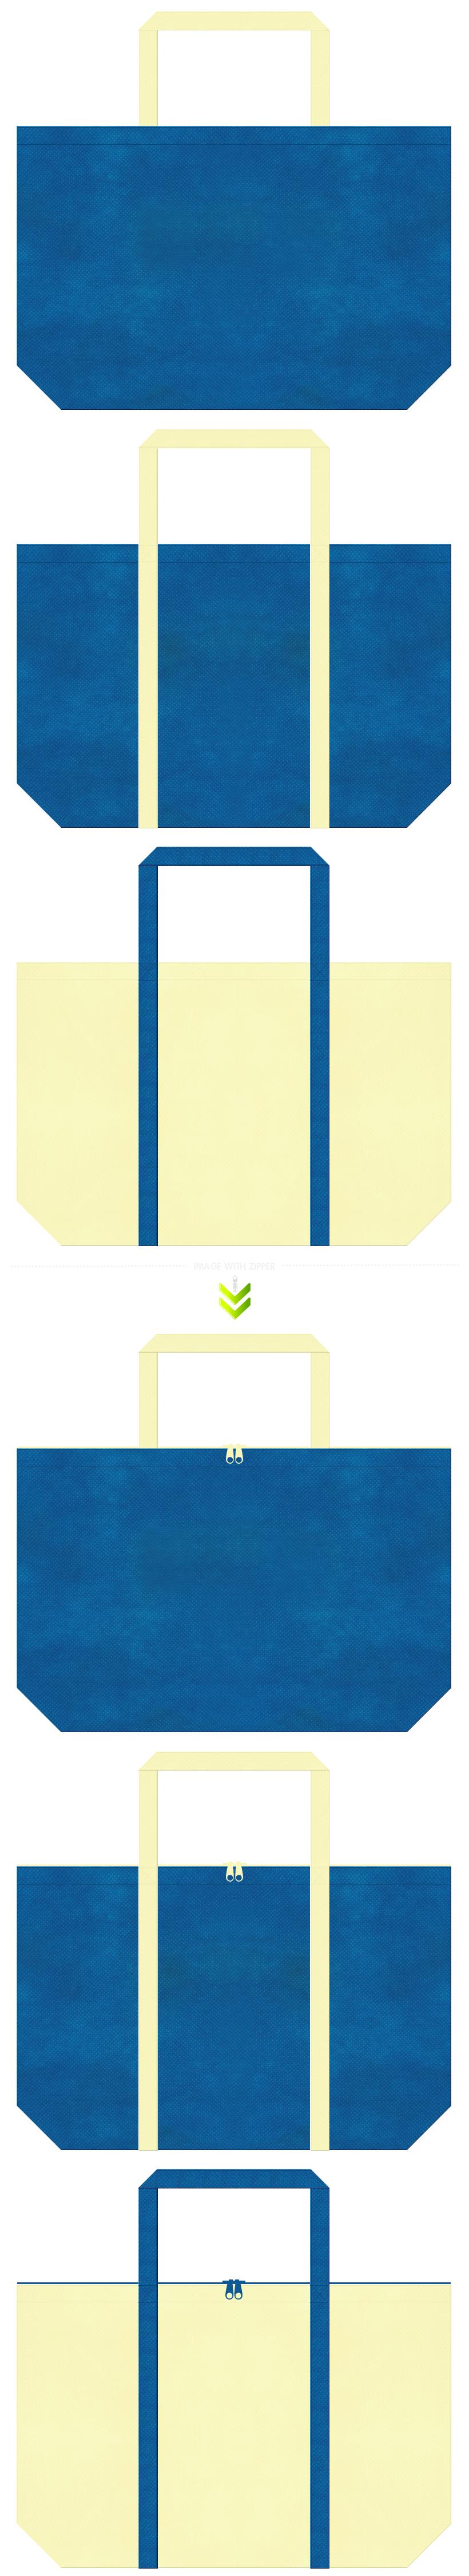 IT・IOT・LED・センサー・ライト・電子部品の展示会用バッグ・父の日ギフトのショッピングバッグにお奨めの不織布バッグデザイン:青色と薄黄色のコーデ